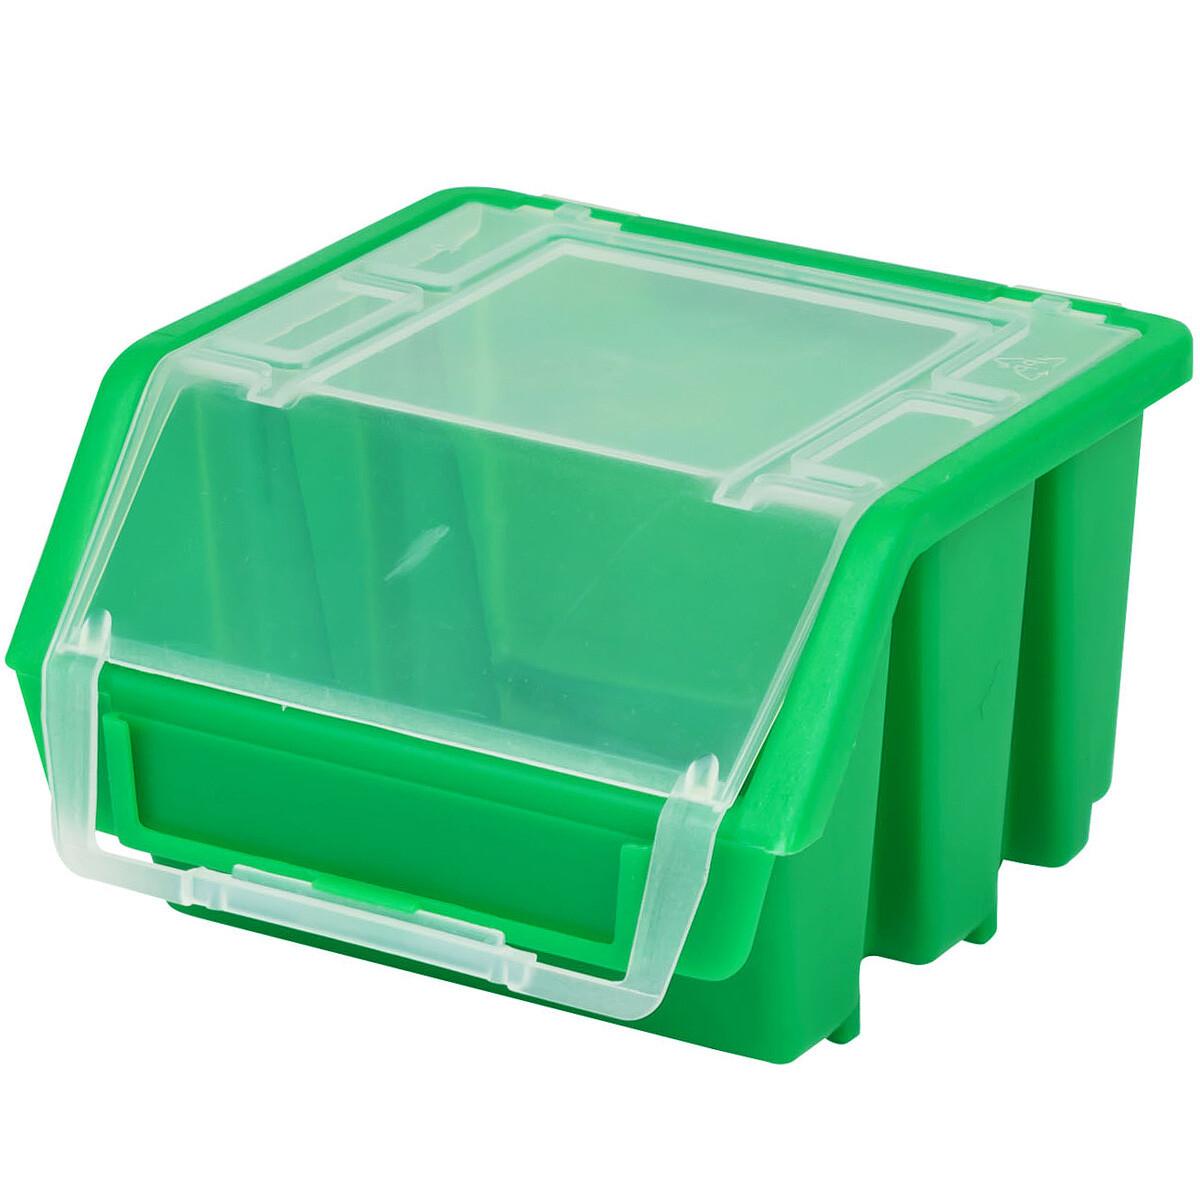 gr n stapelbox stapelkiste sauberes lagern kleinteilekiste mit deckel 0 84. Black Bedroom Furniture Sets. Home Design Ideas